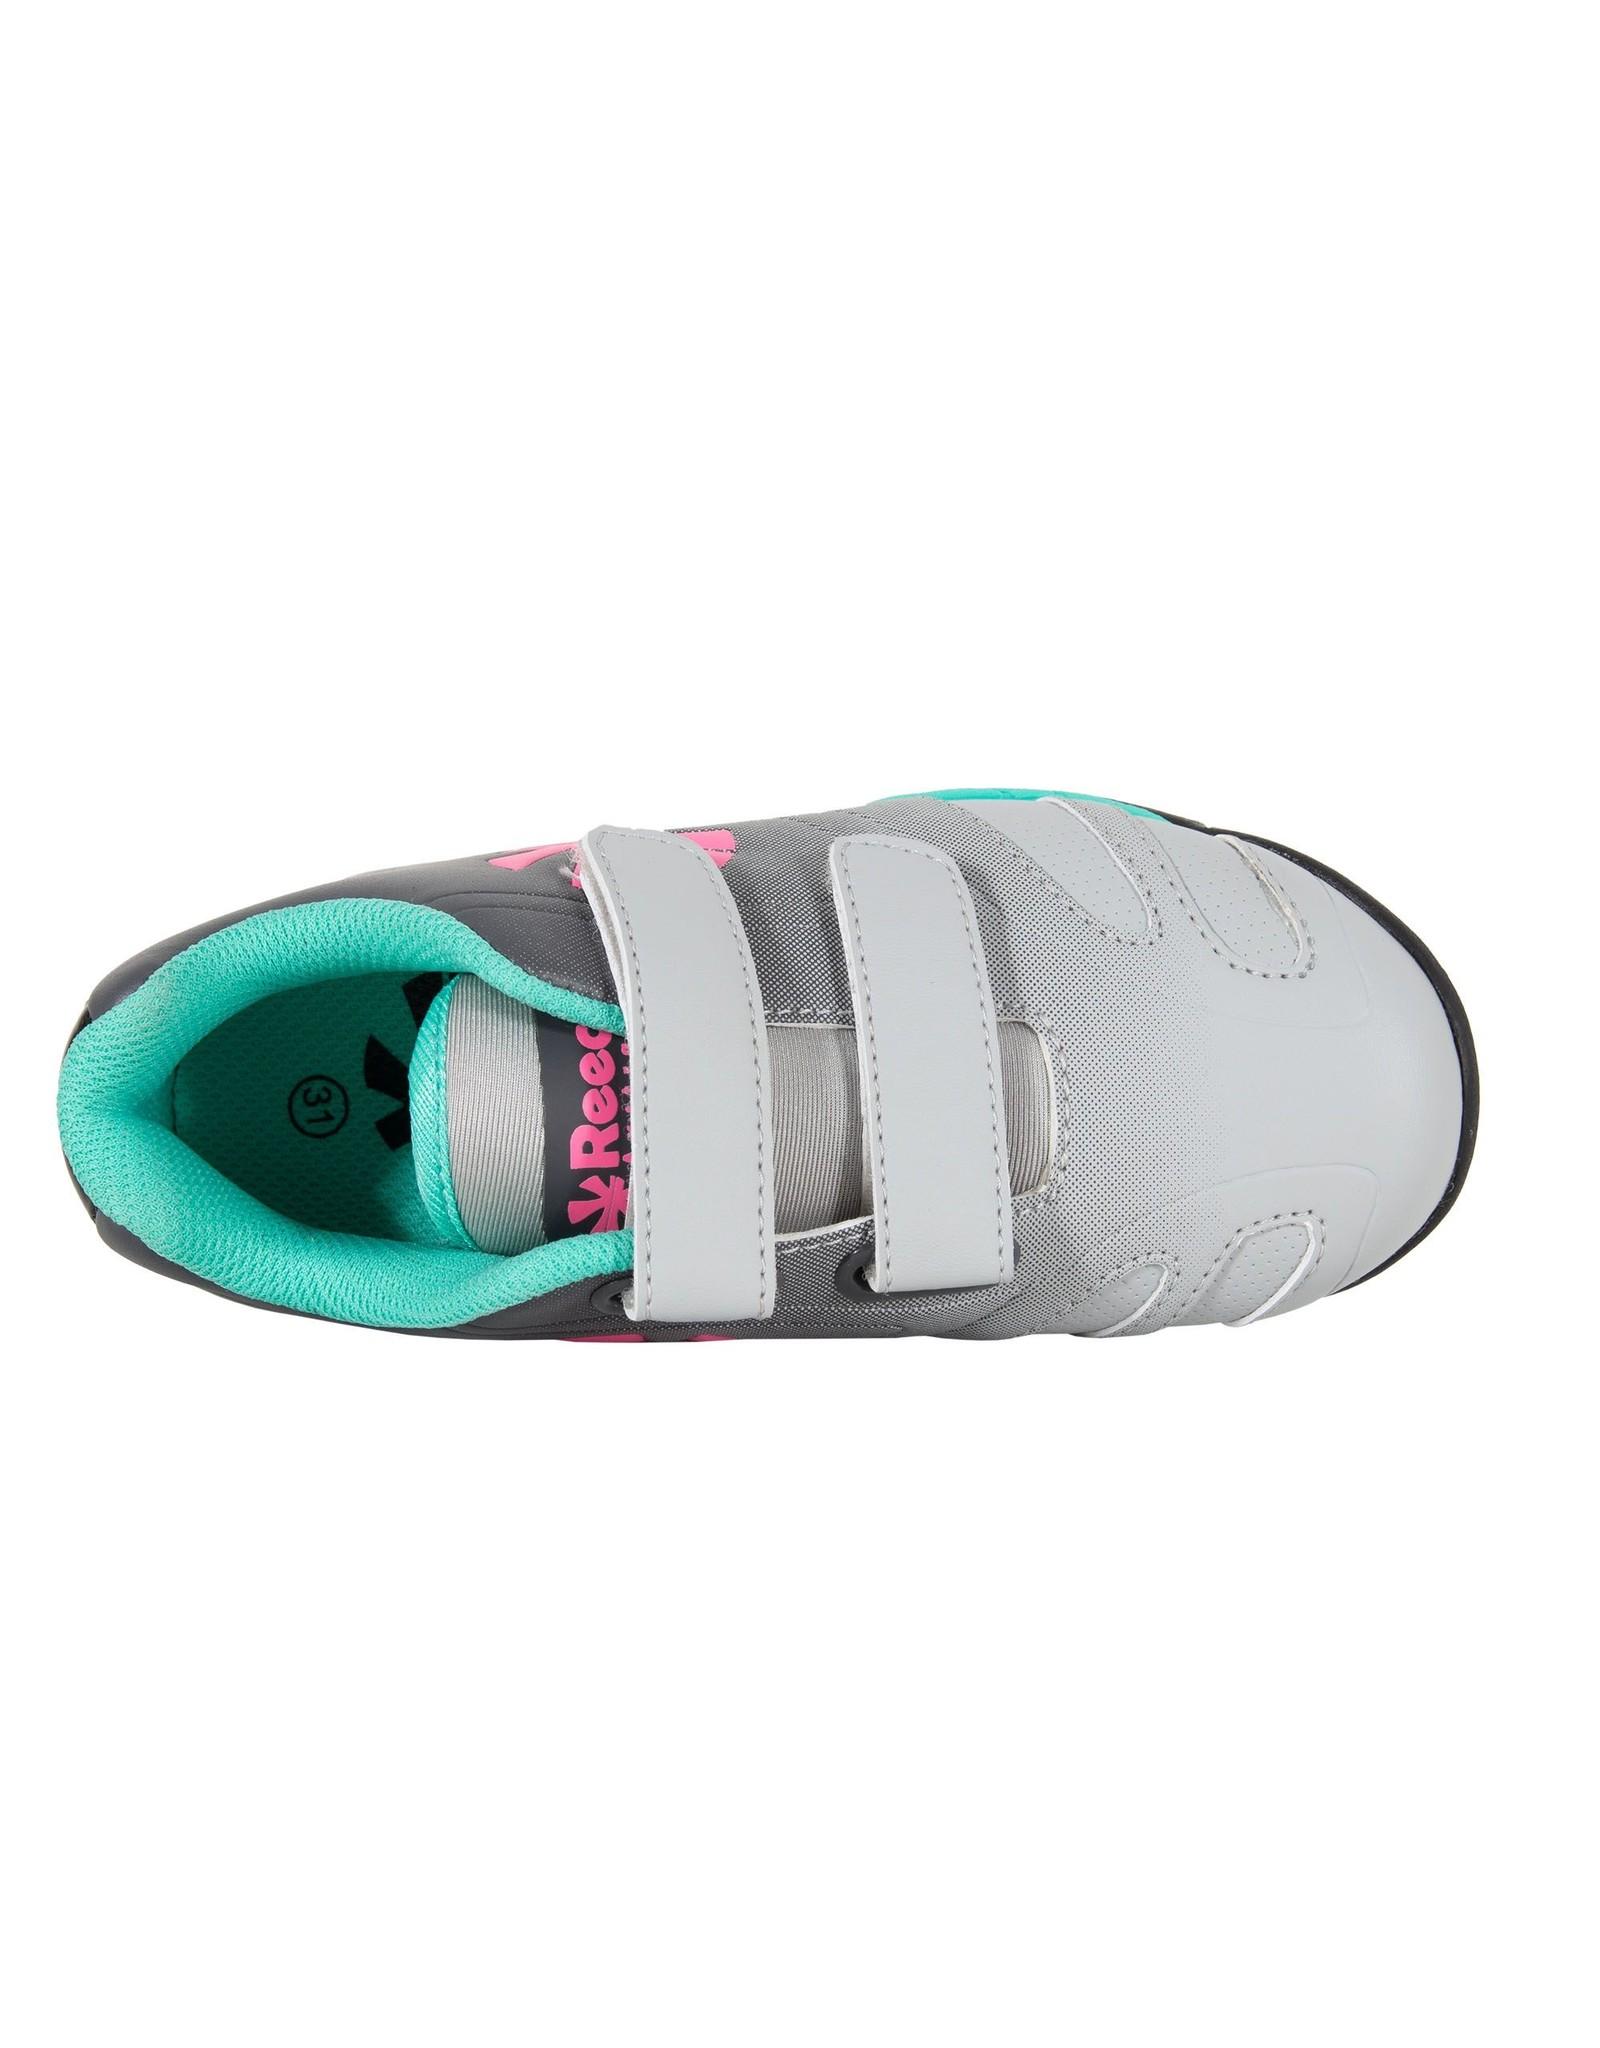 Reece Australia Bully X80 - Outdoor-Grey-Mint-Pink